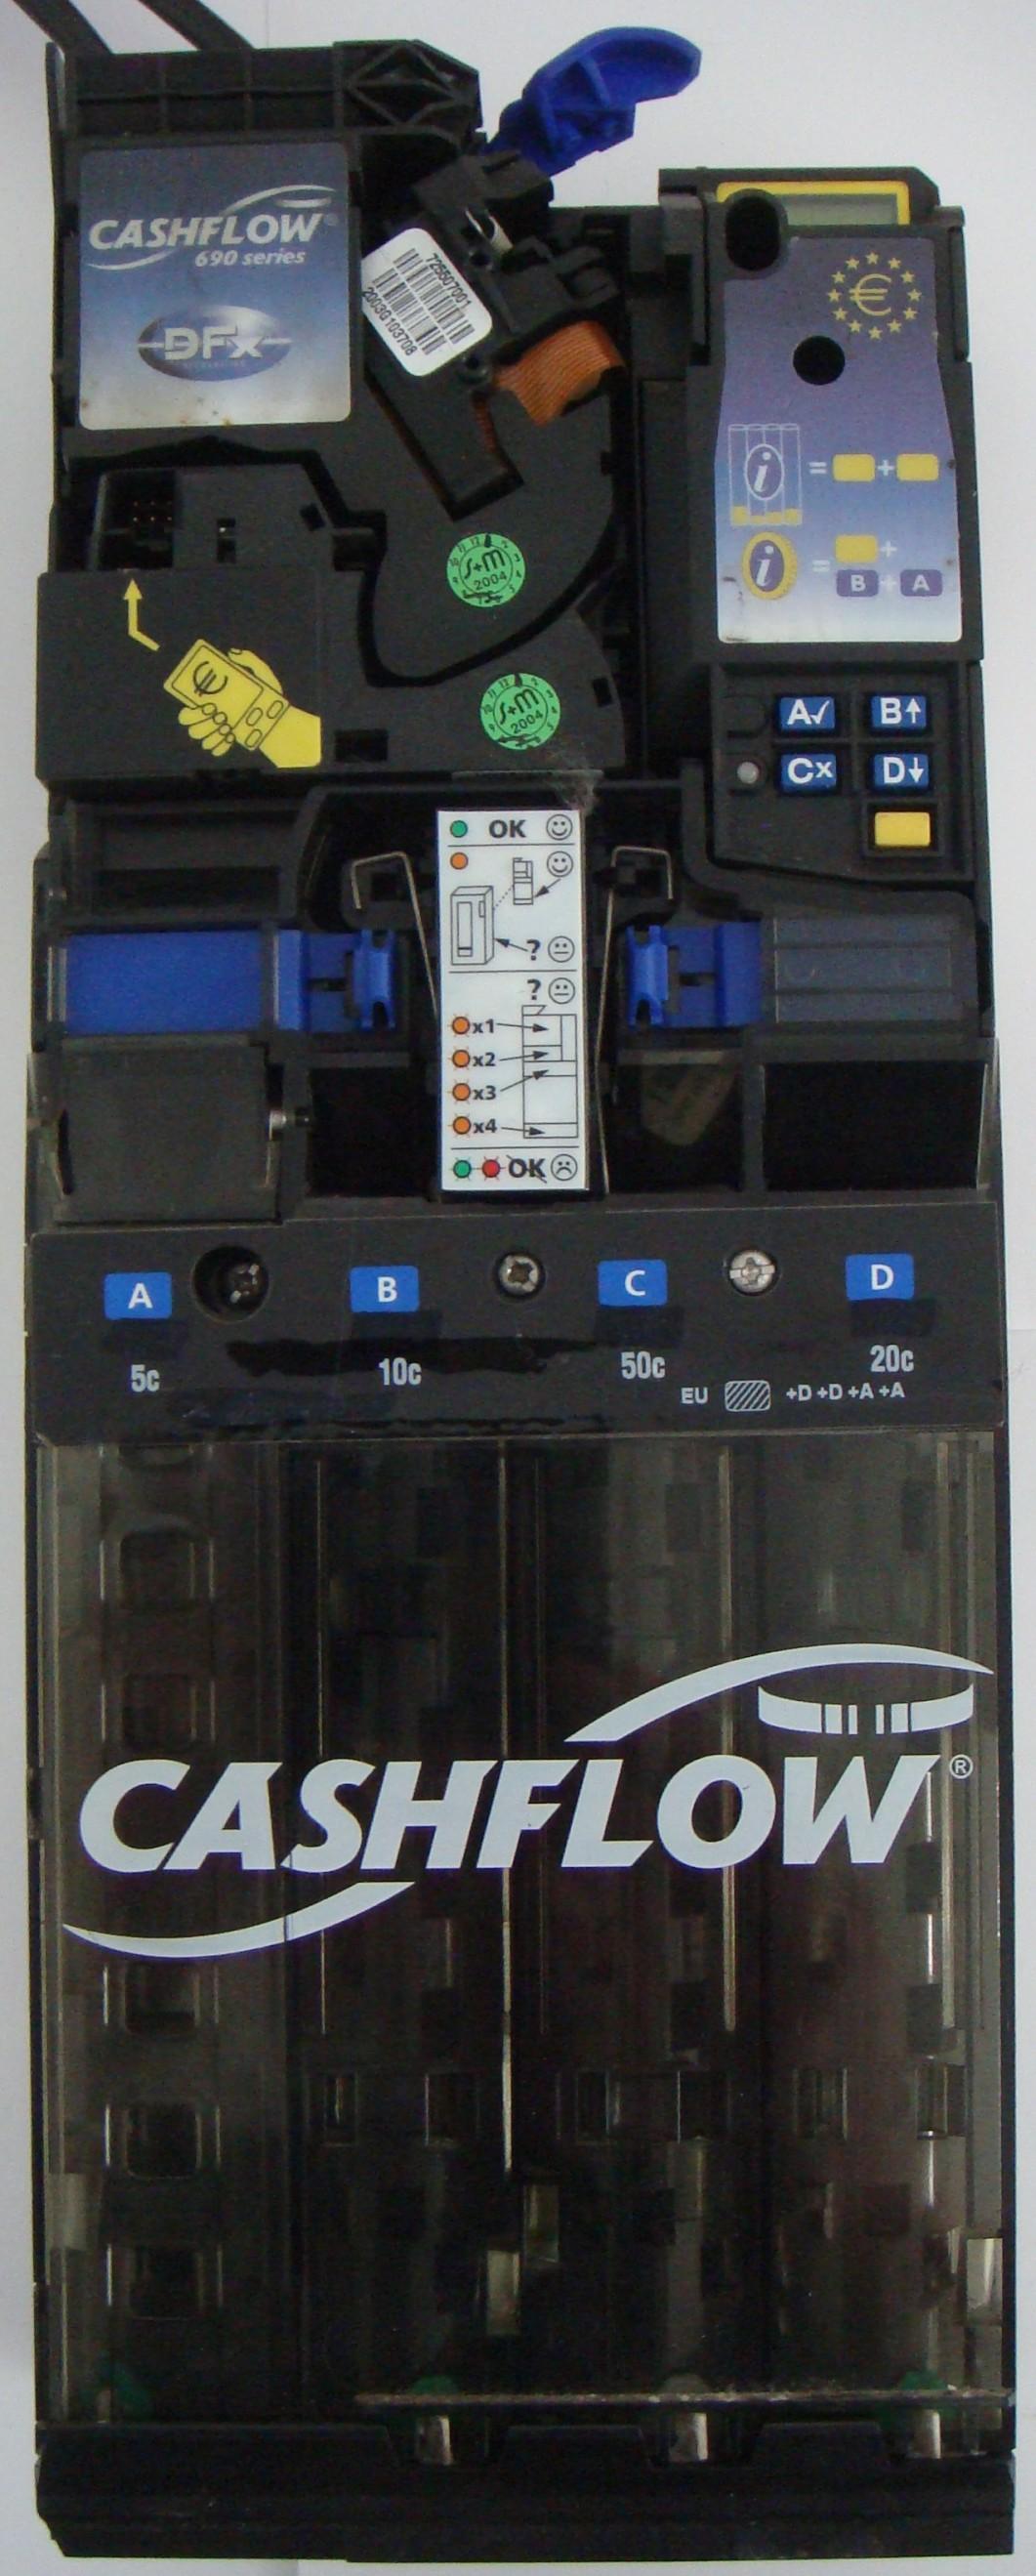 Cashflow 690